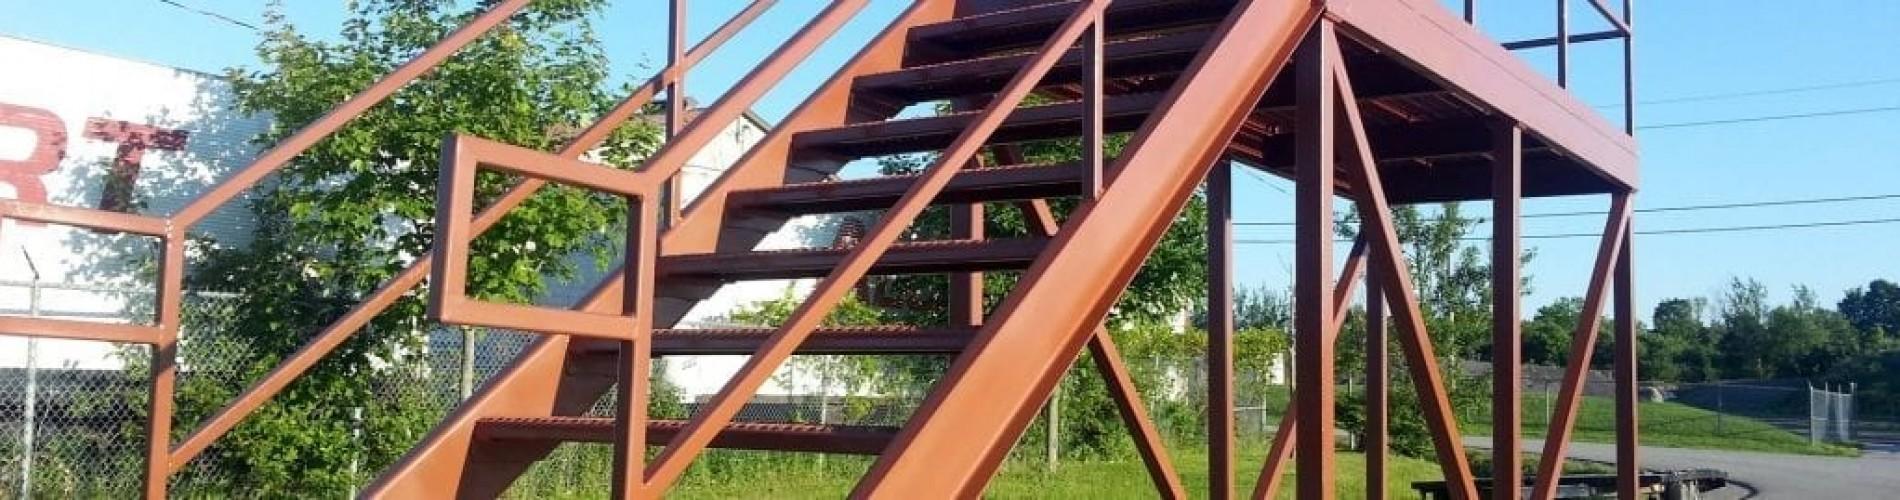 SteelWorkPlatform